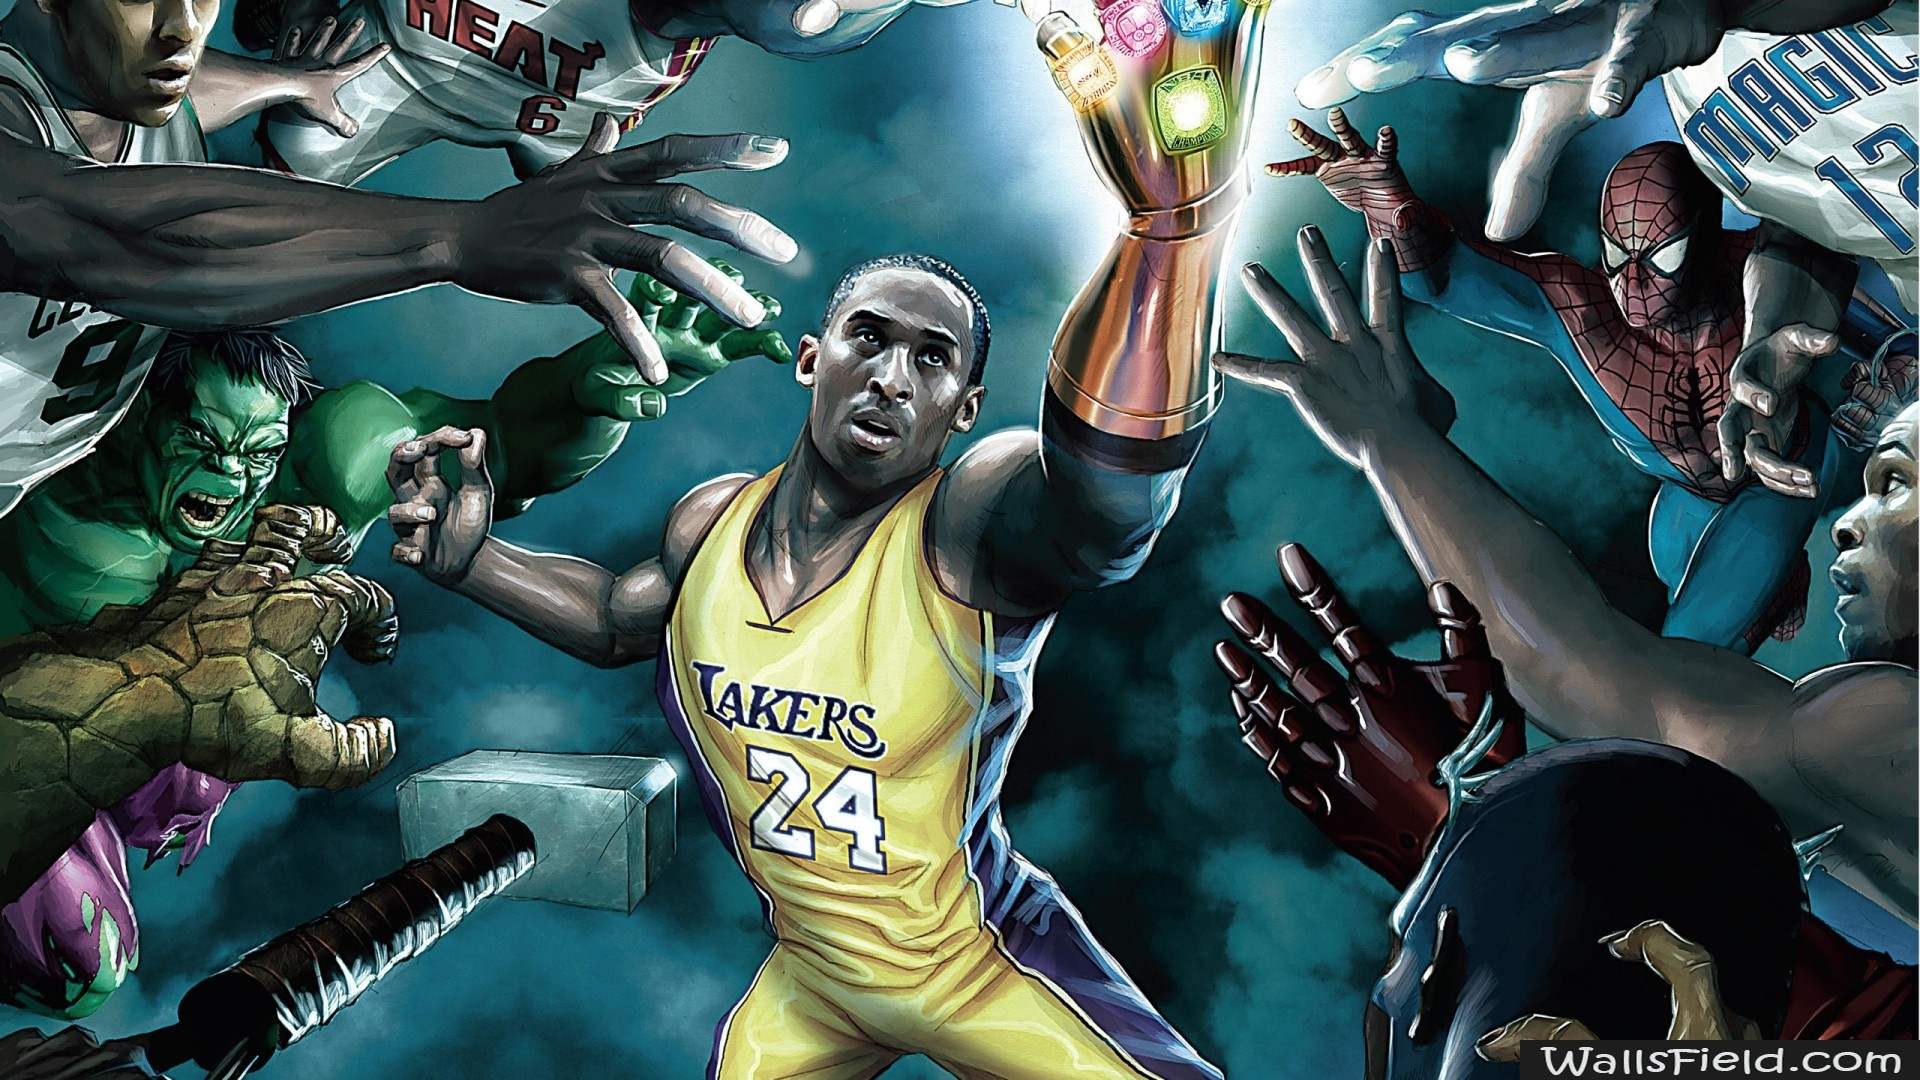 … NBA Wallpapers HD 13 …